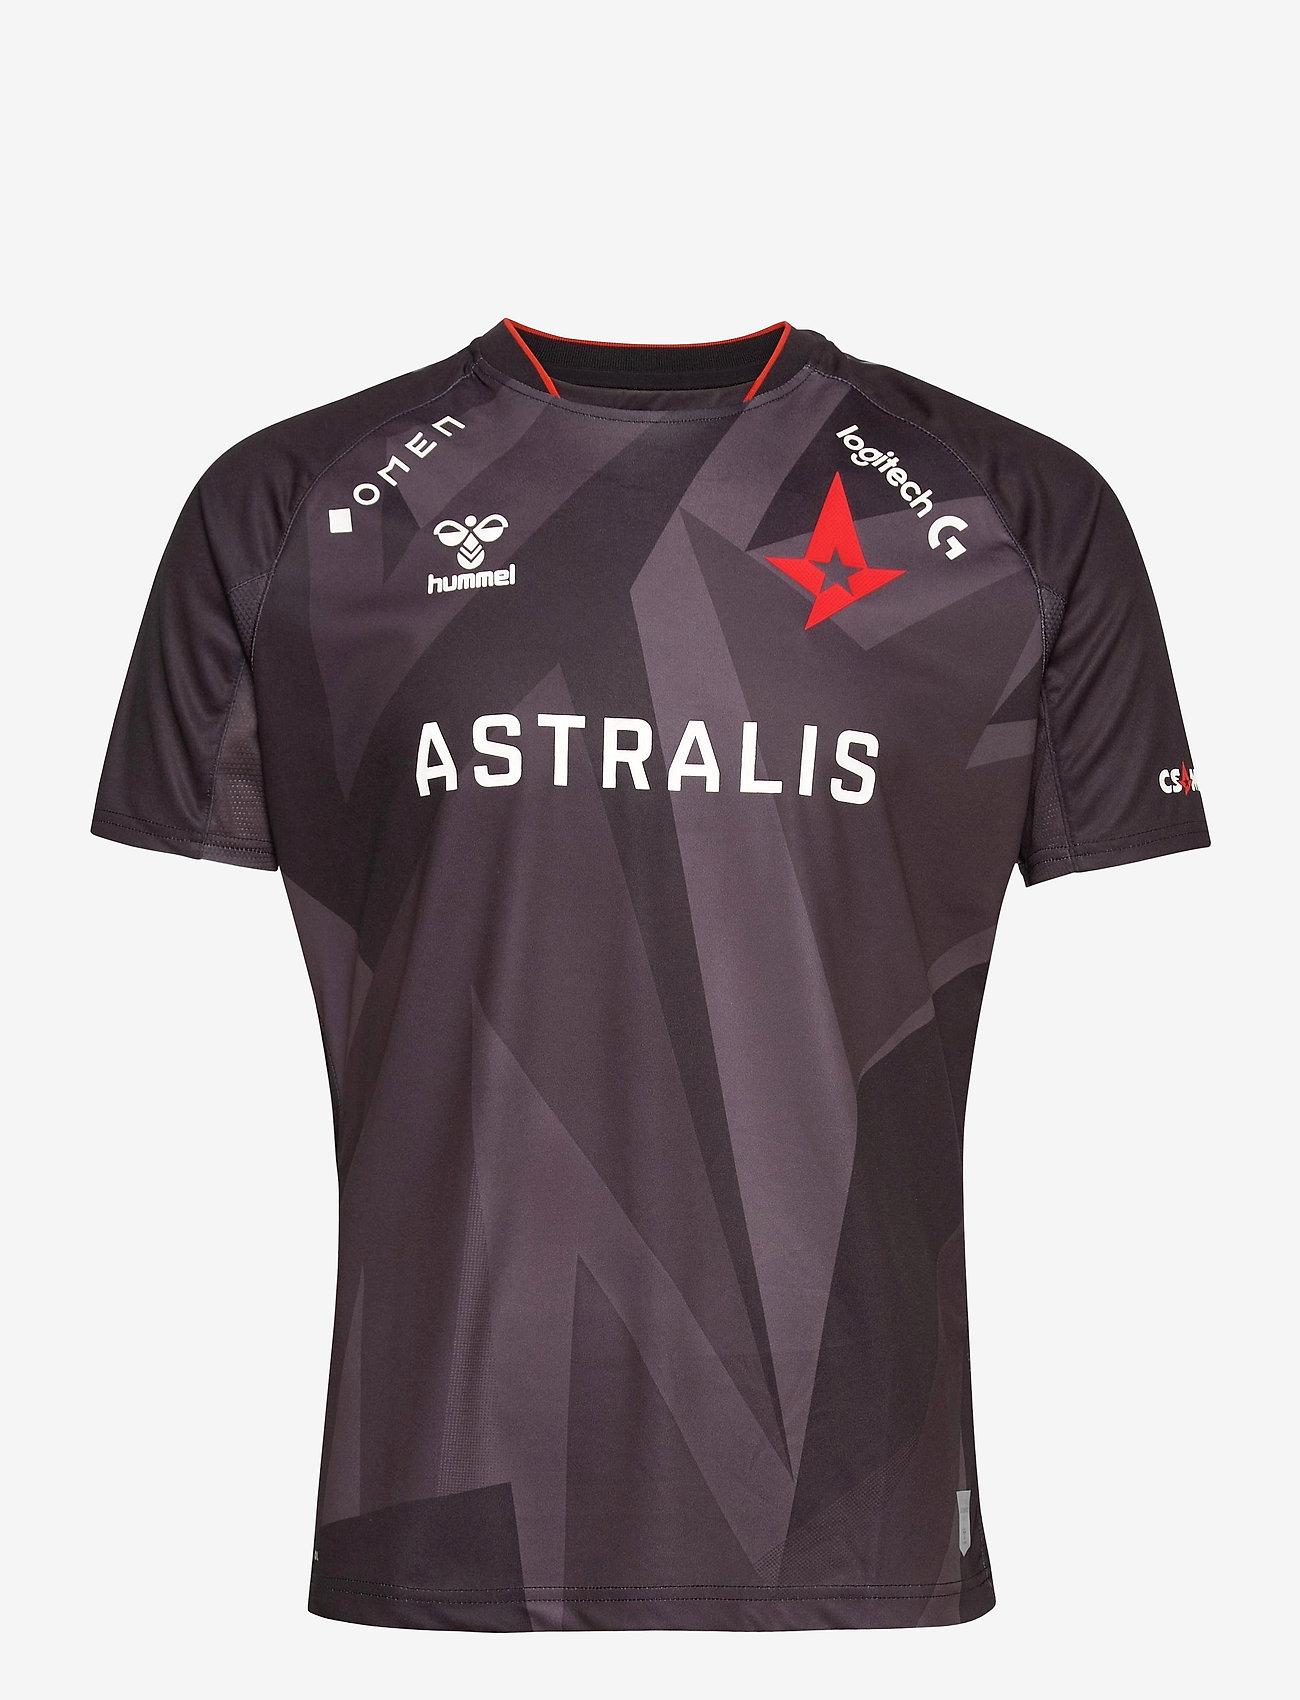 Hummel - ASTRALIS 20/21 GAME JERSEY S/S - football shirts - black w/logo - 0